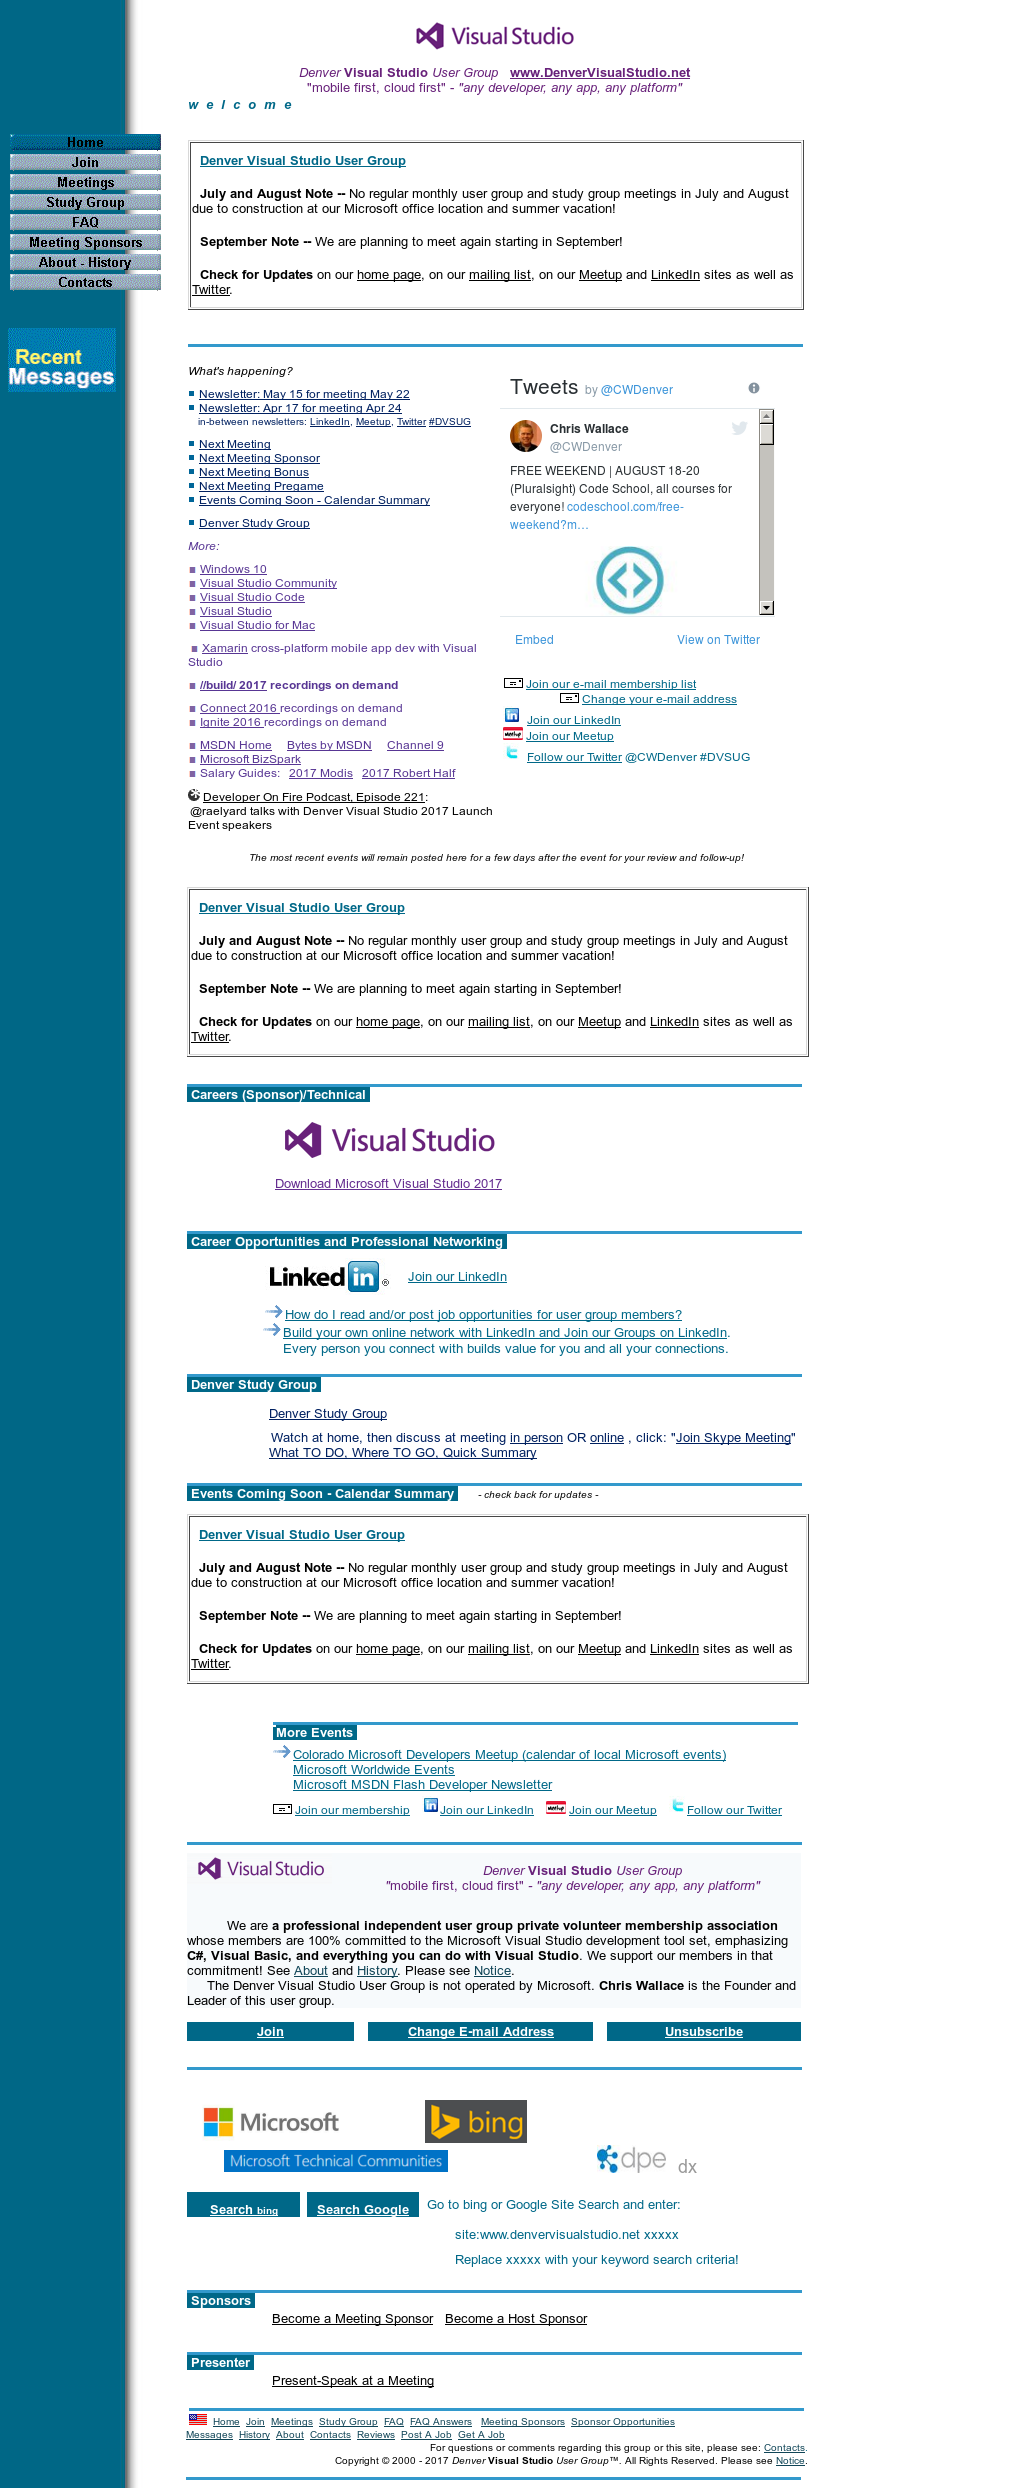 Denver Visual Studio User Group Competitors, Revenue and